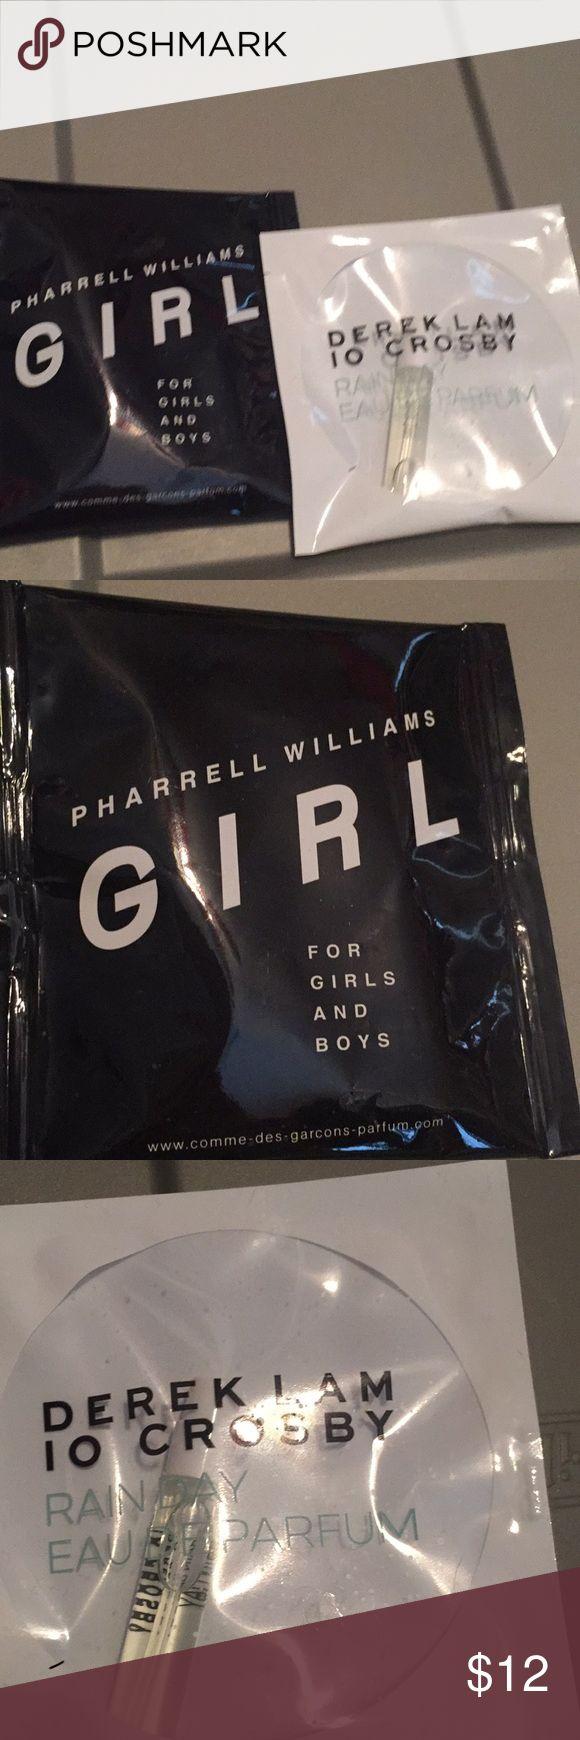 Parfum 1-1.5ml Pharrell Williams girl. 1-1.5ml Derek Lam Io Crosby Rain day parfum 10 Crosby Derek Lam Other